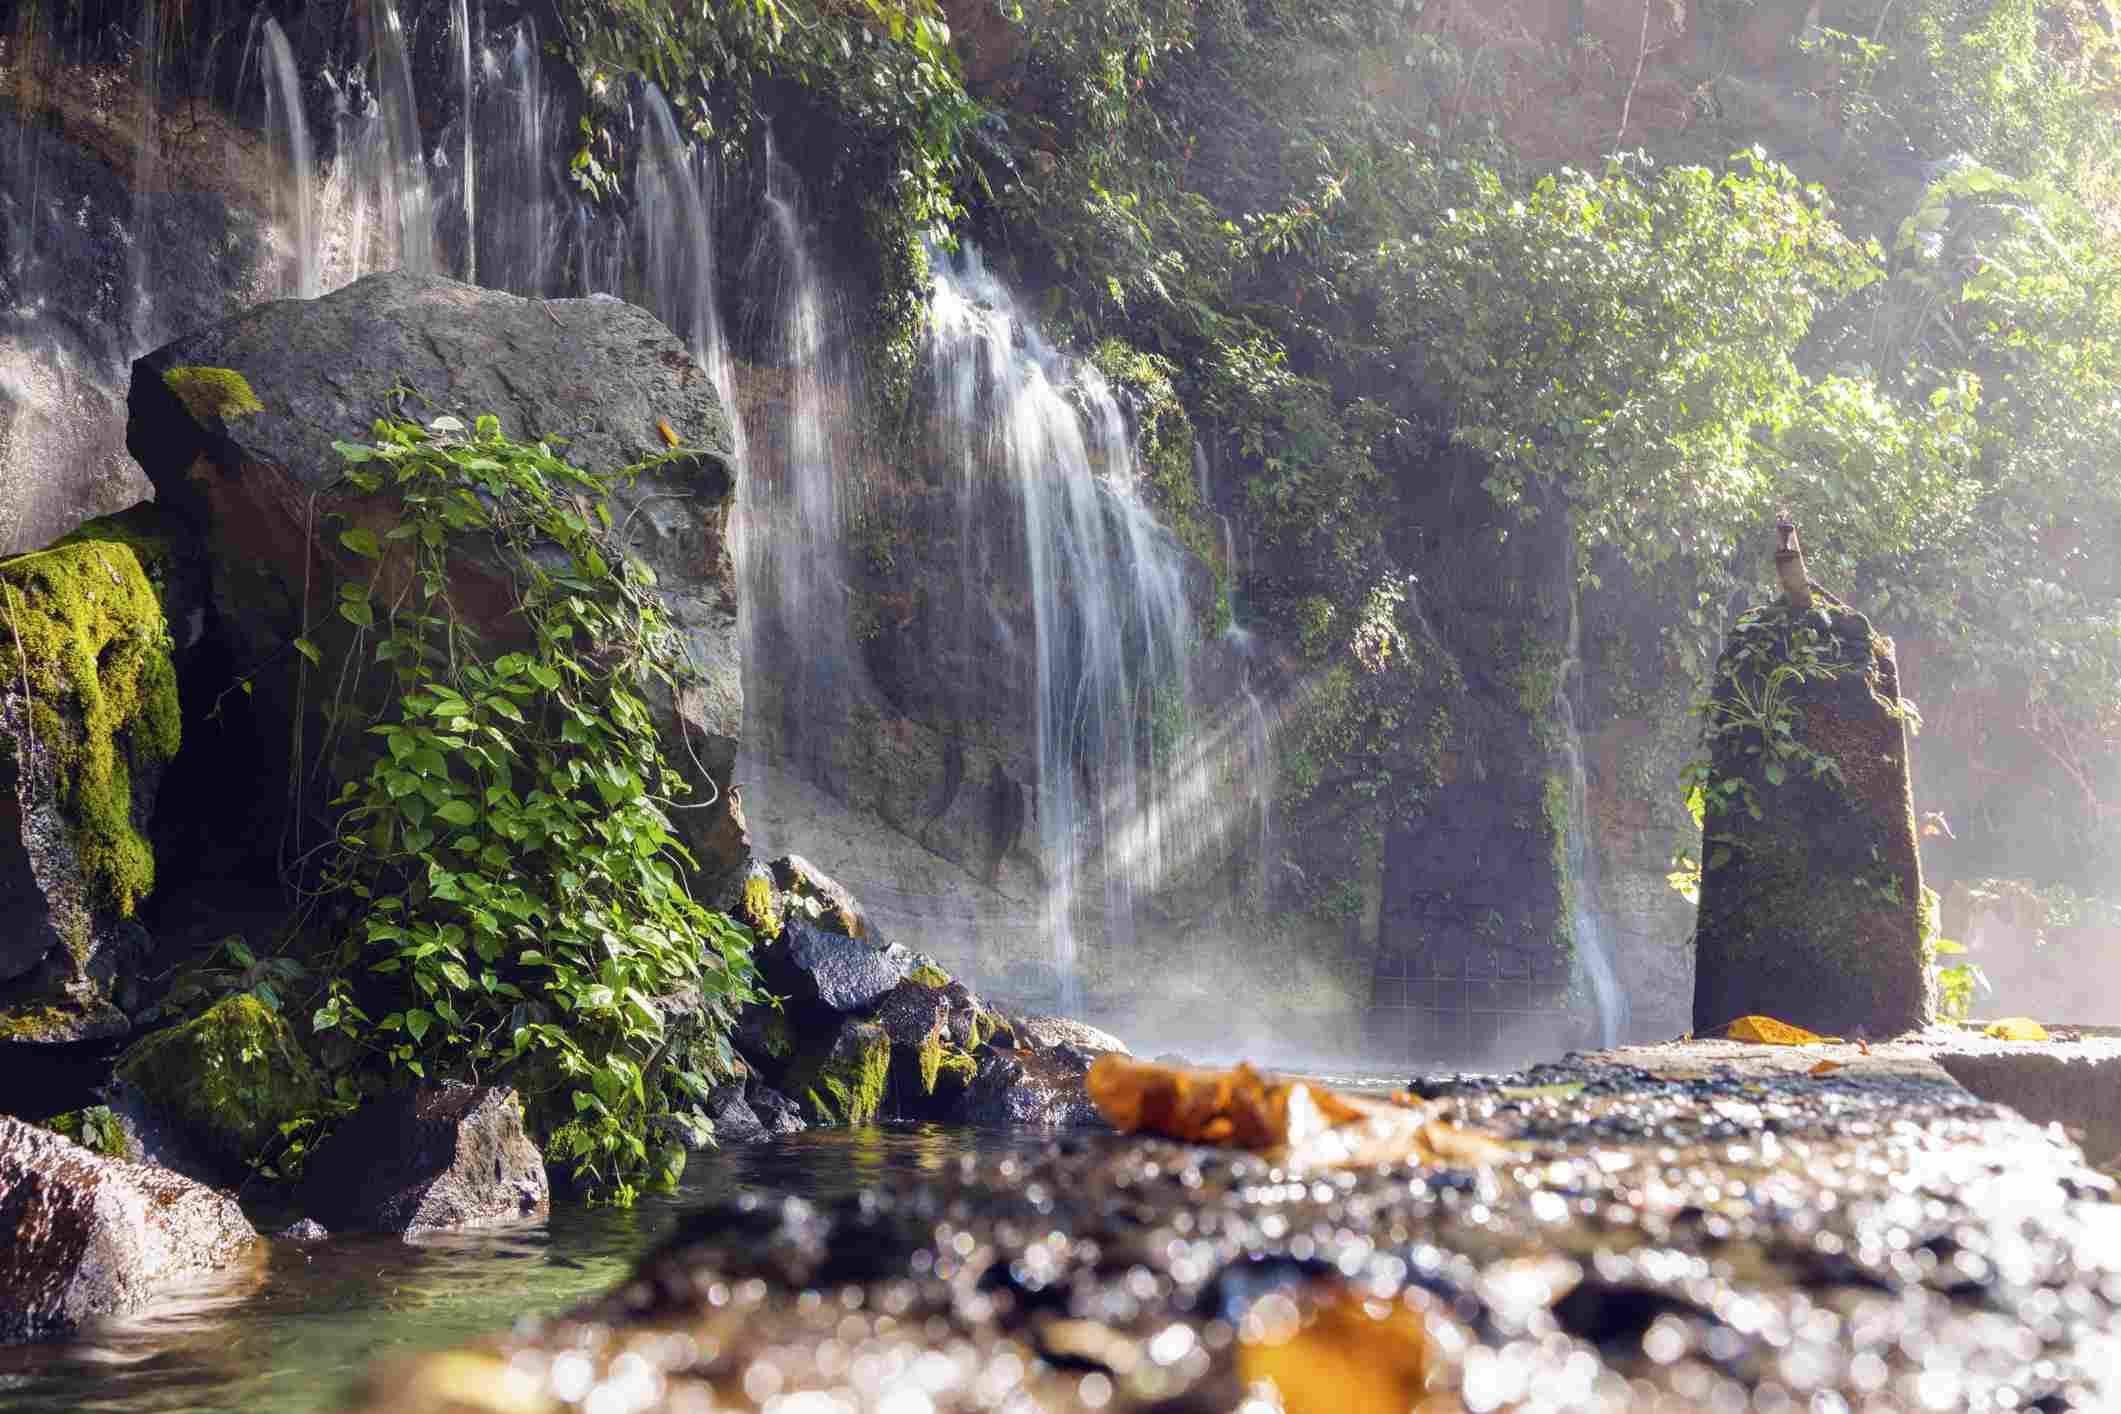 Small waterfalls and rocks at El Salvador's Seven Waterfalls in Juayua